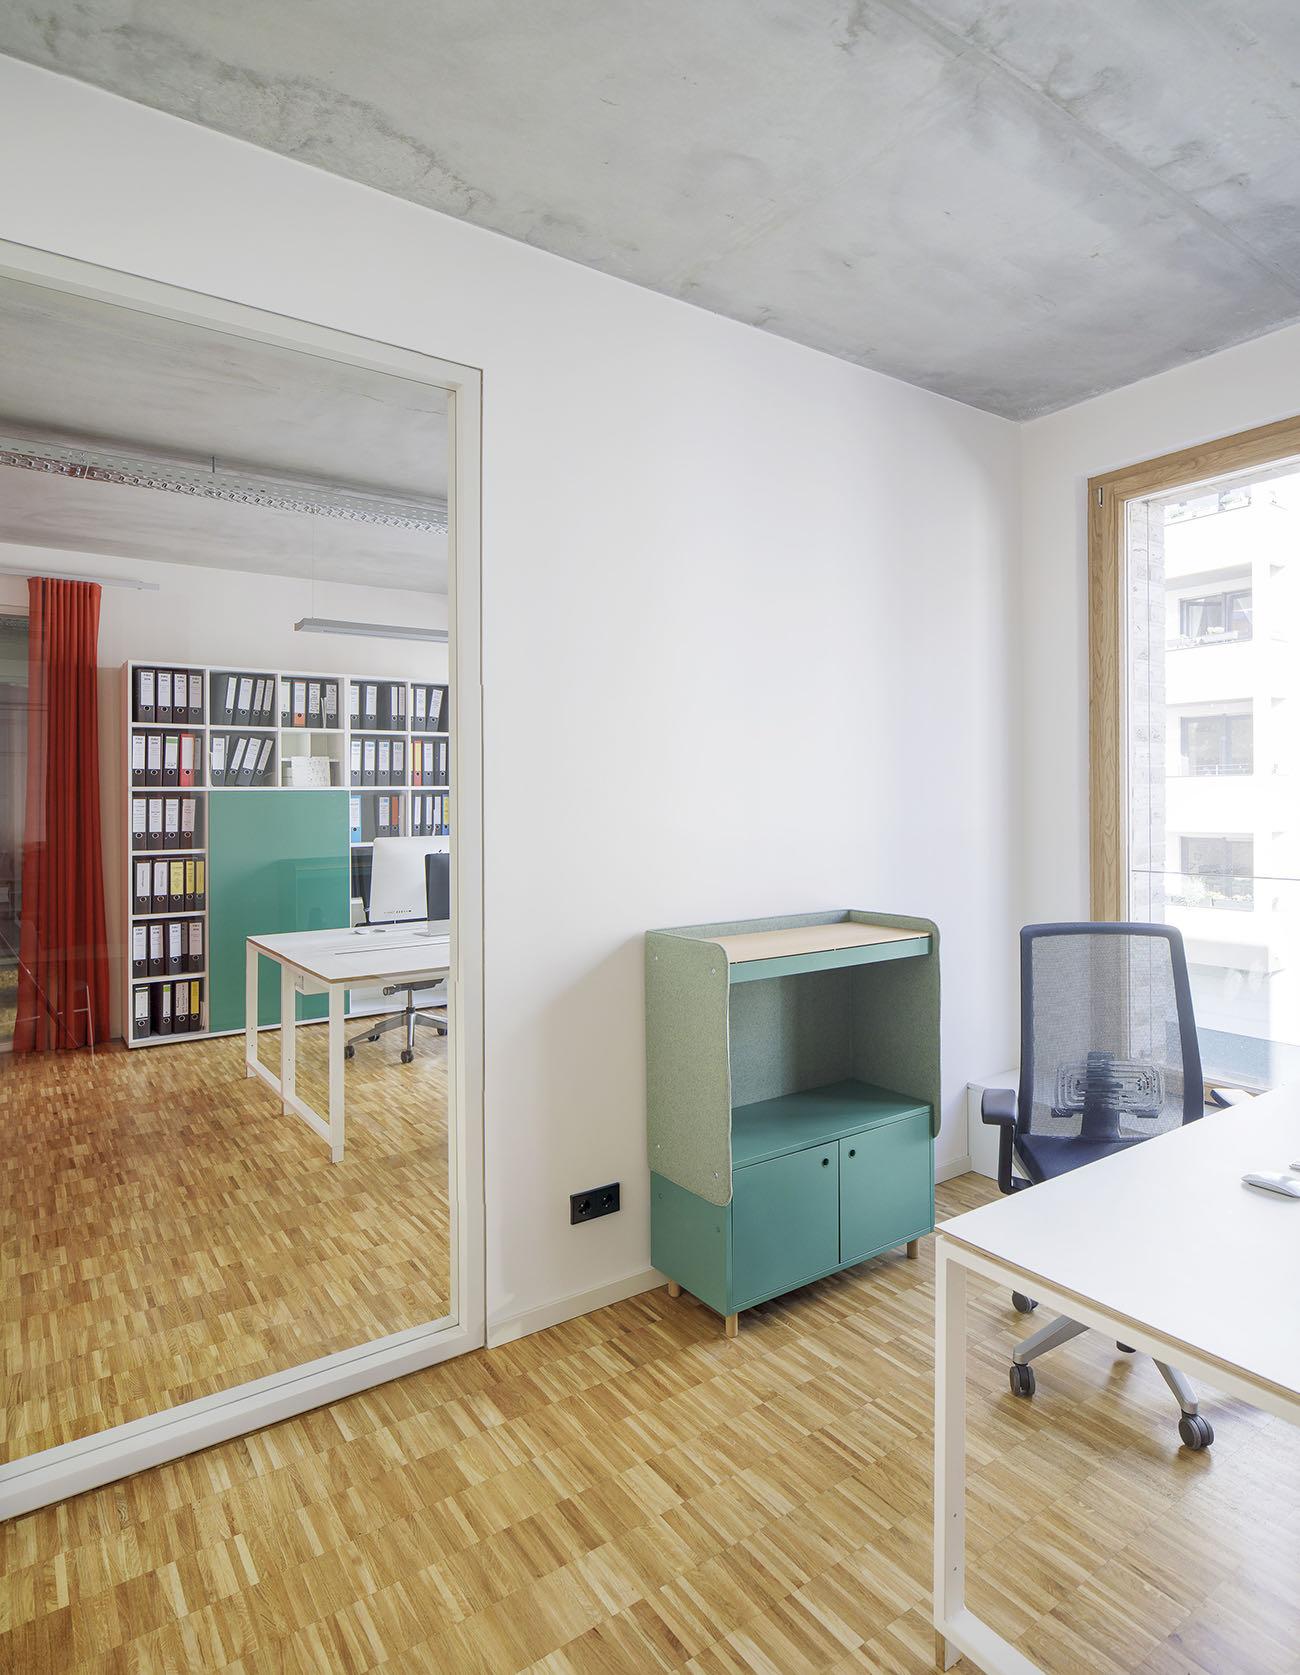 velokonzept-berlin-office-12